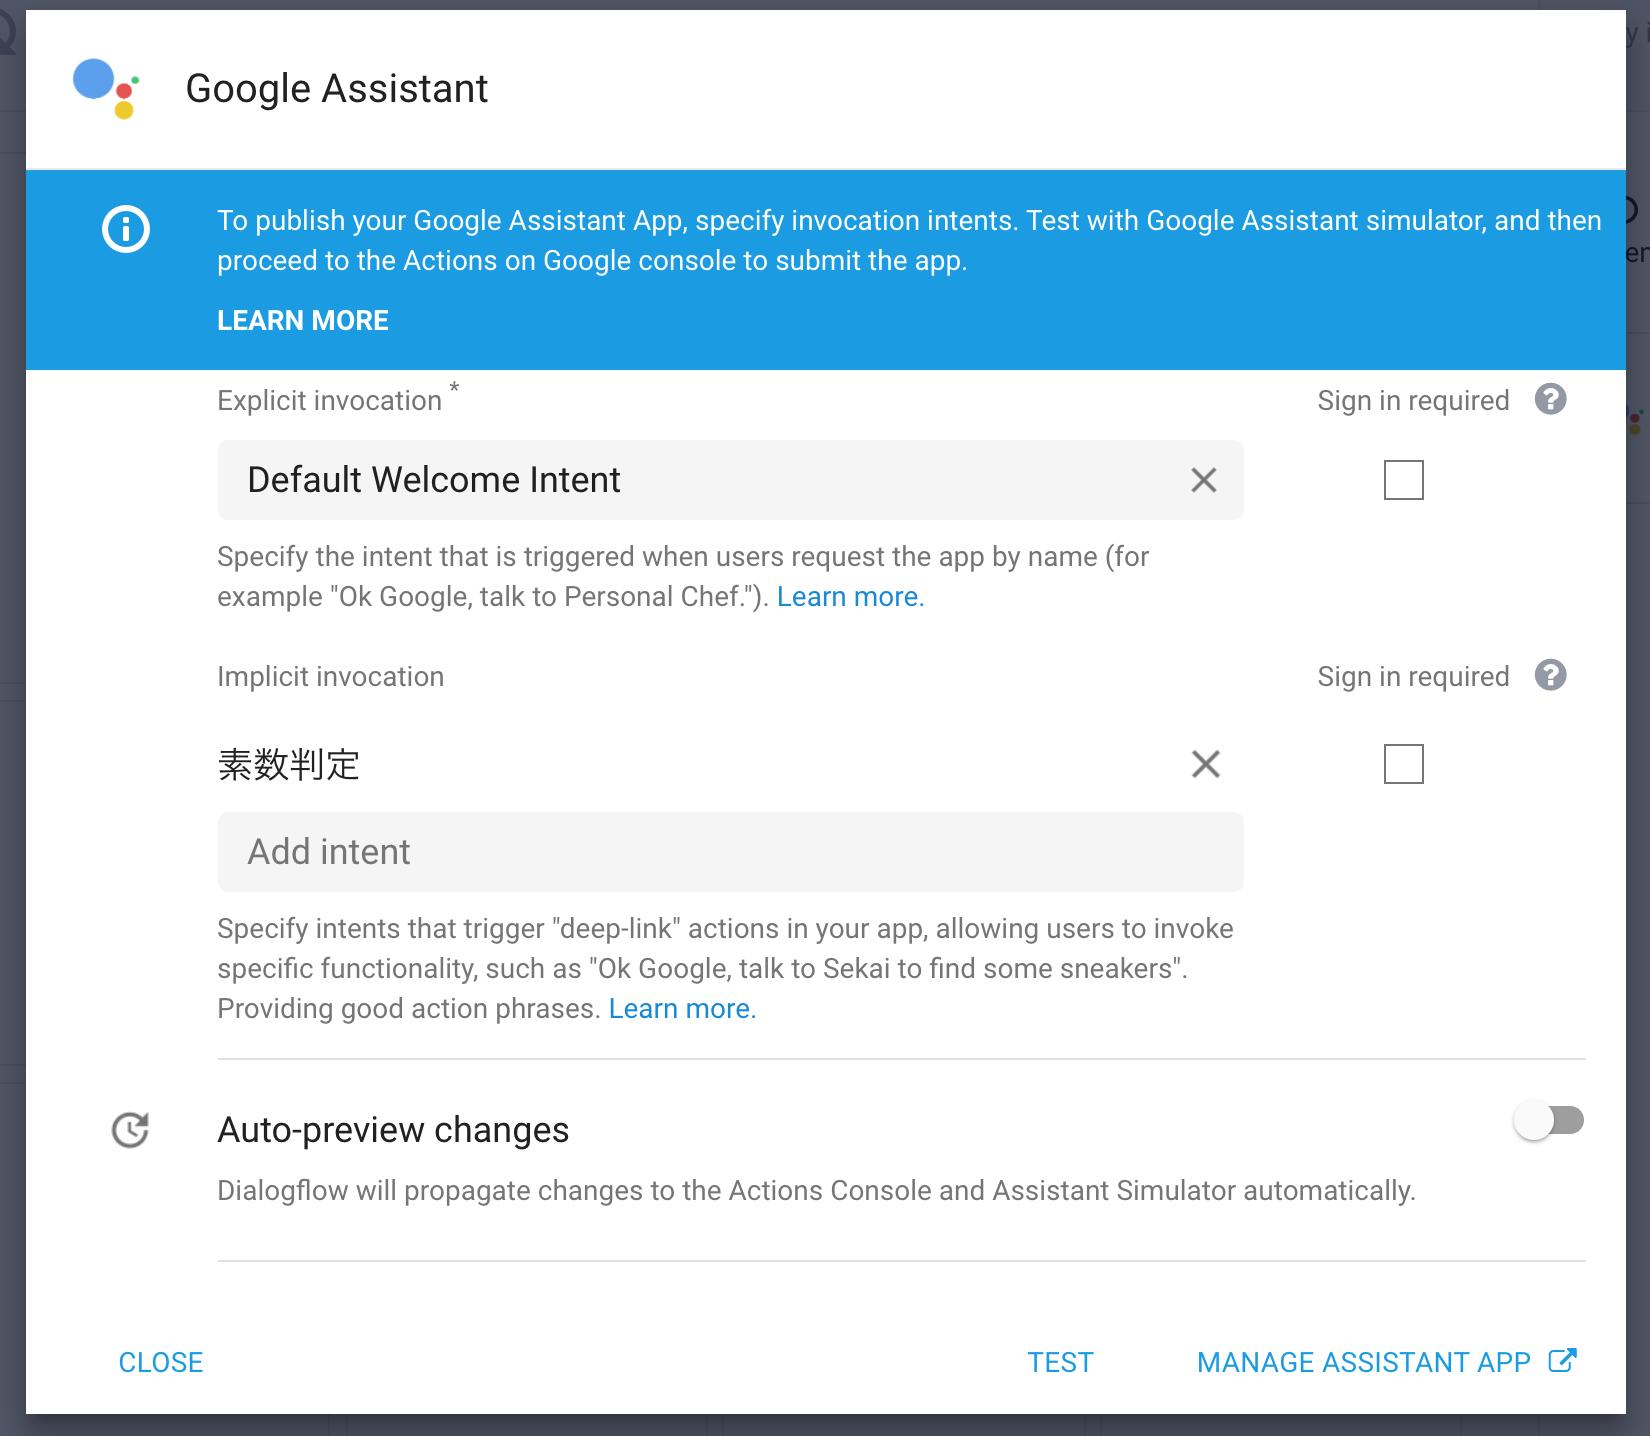 manage-assistant-app.png